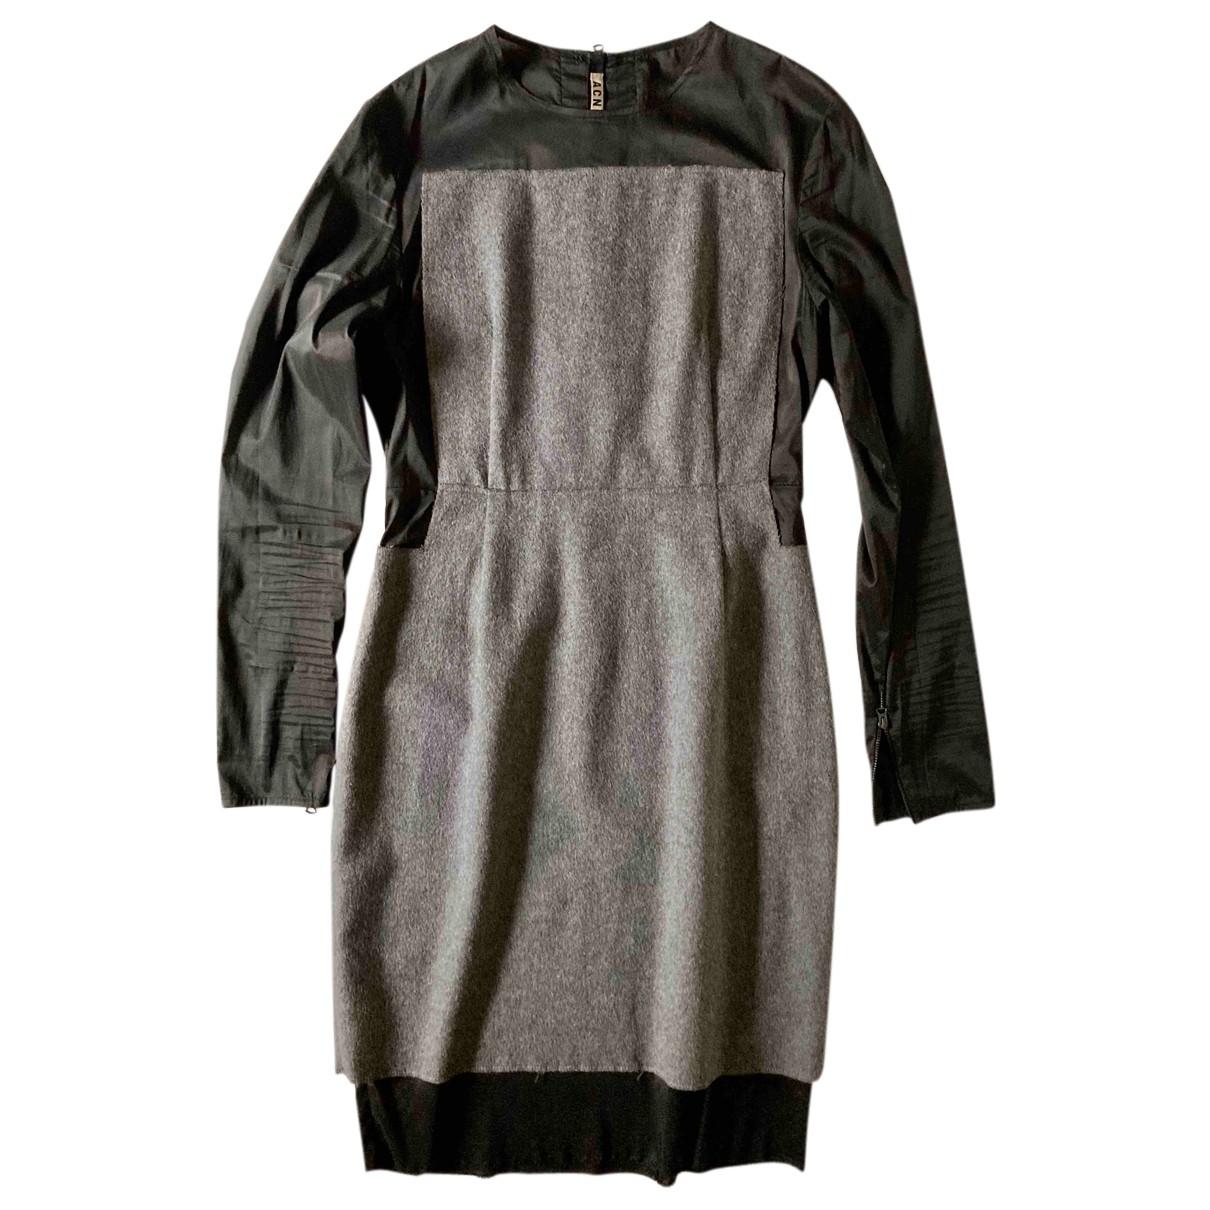 Acne Studios N Grey Wool dress for Women 40 FR